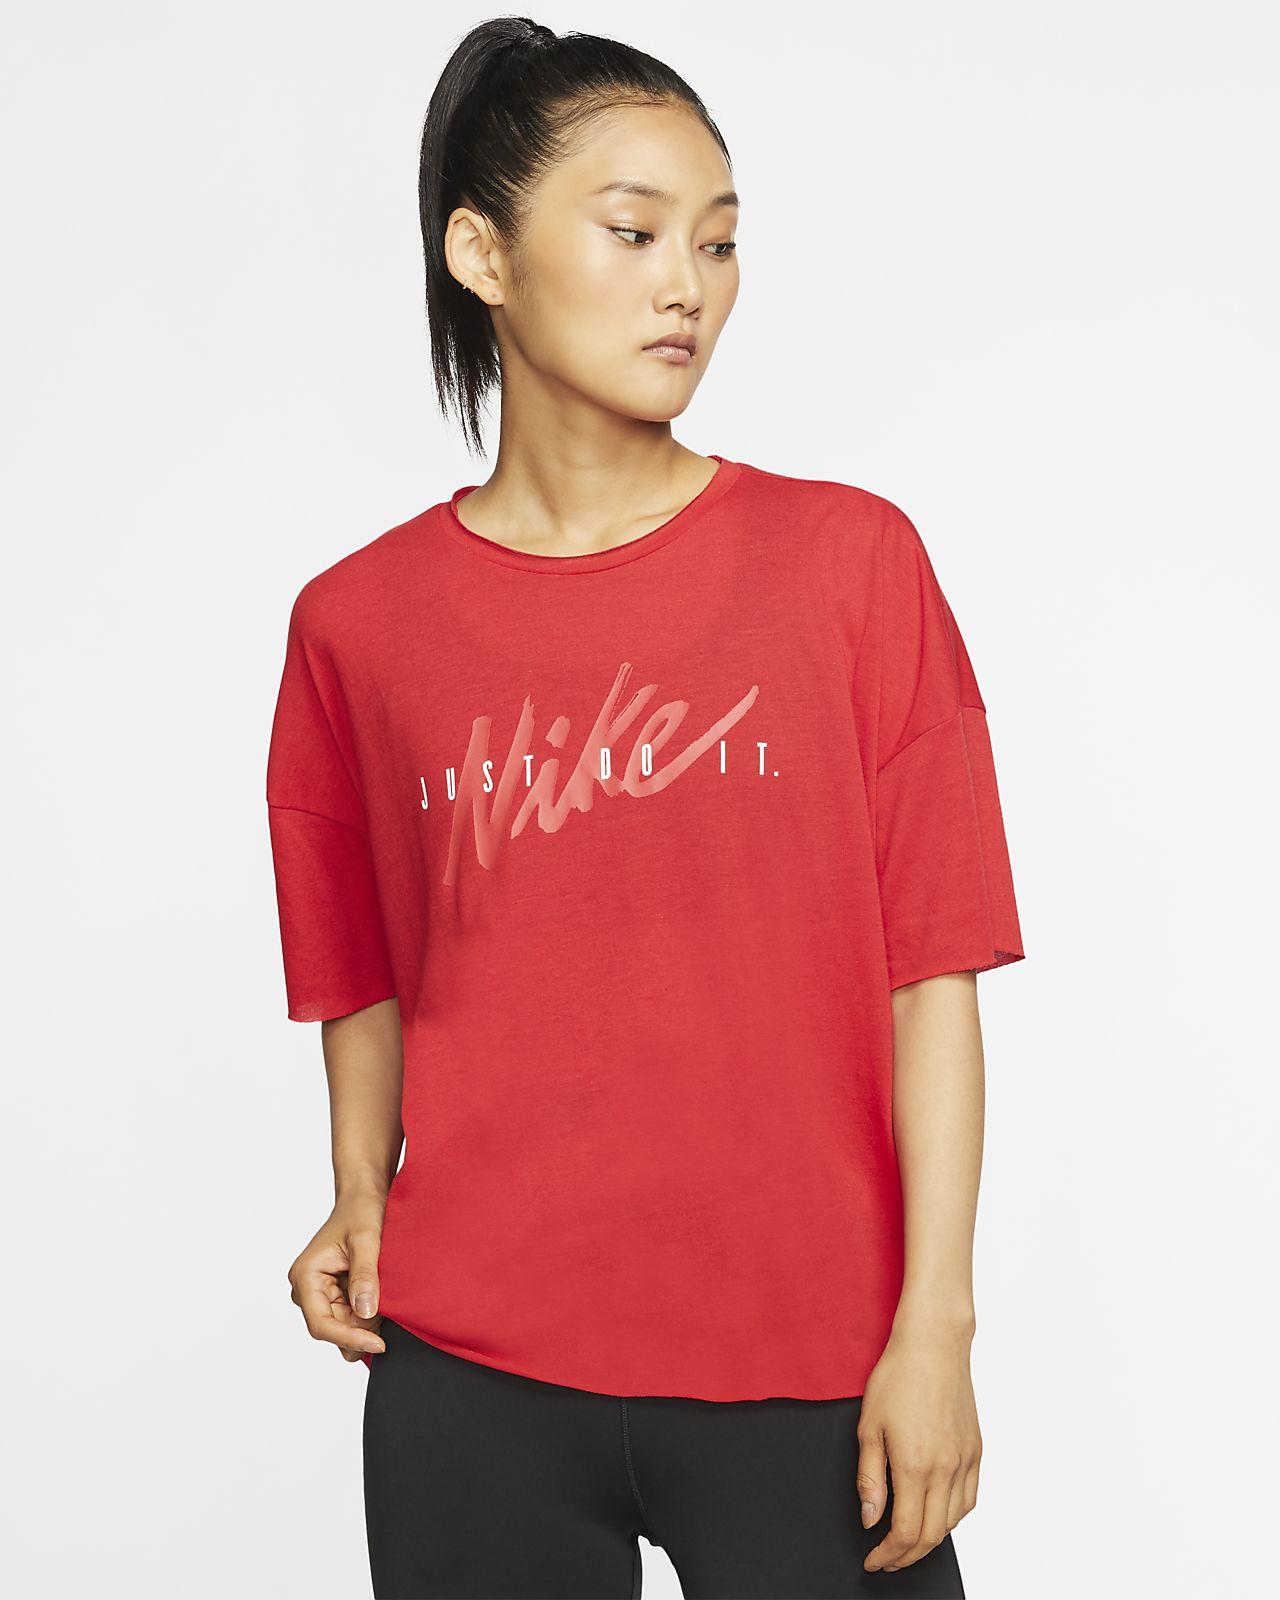 Nike Dri-FIT Women's Short-Sleeve Training Top